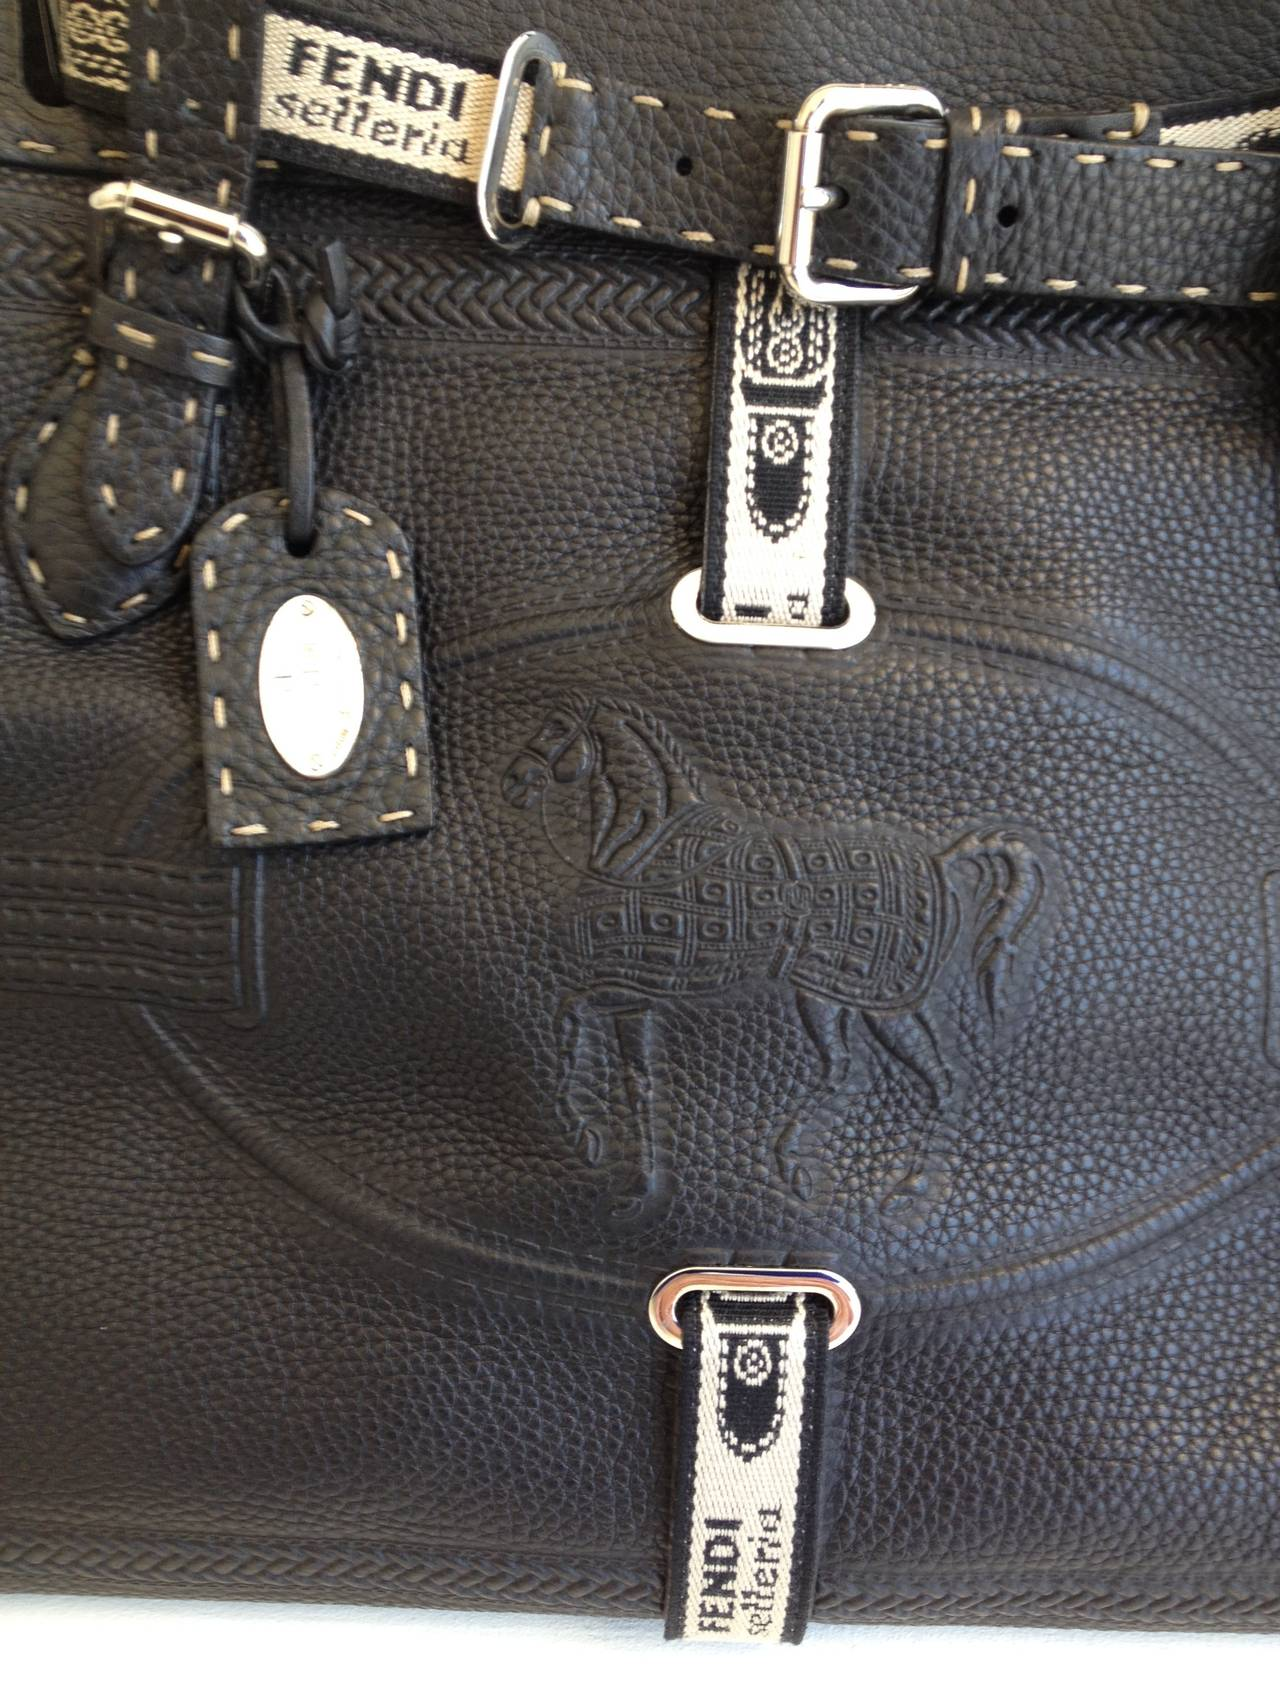 Fendi Black Grand Borghese Selleria Handbag At 1stdibs